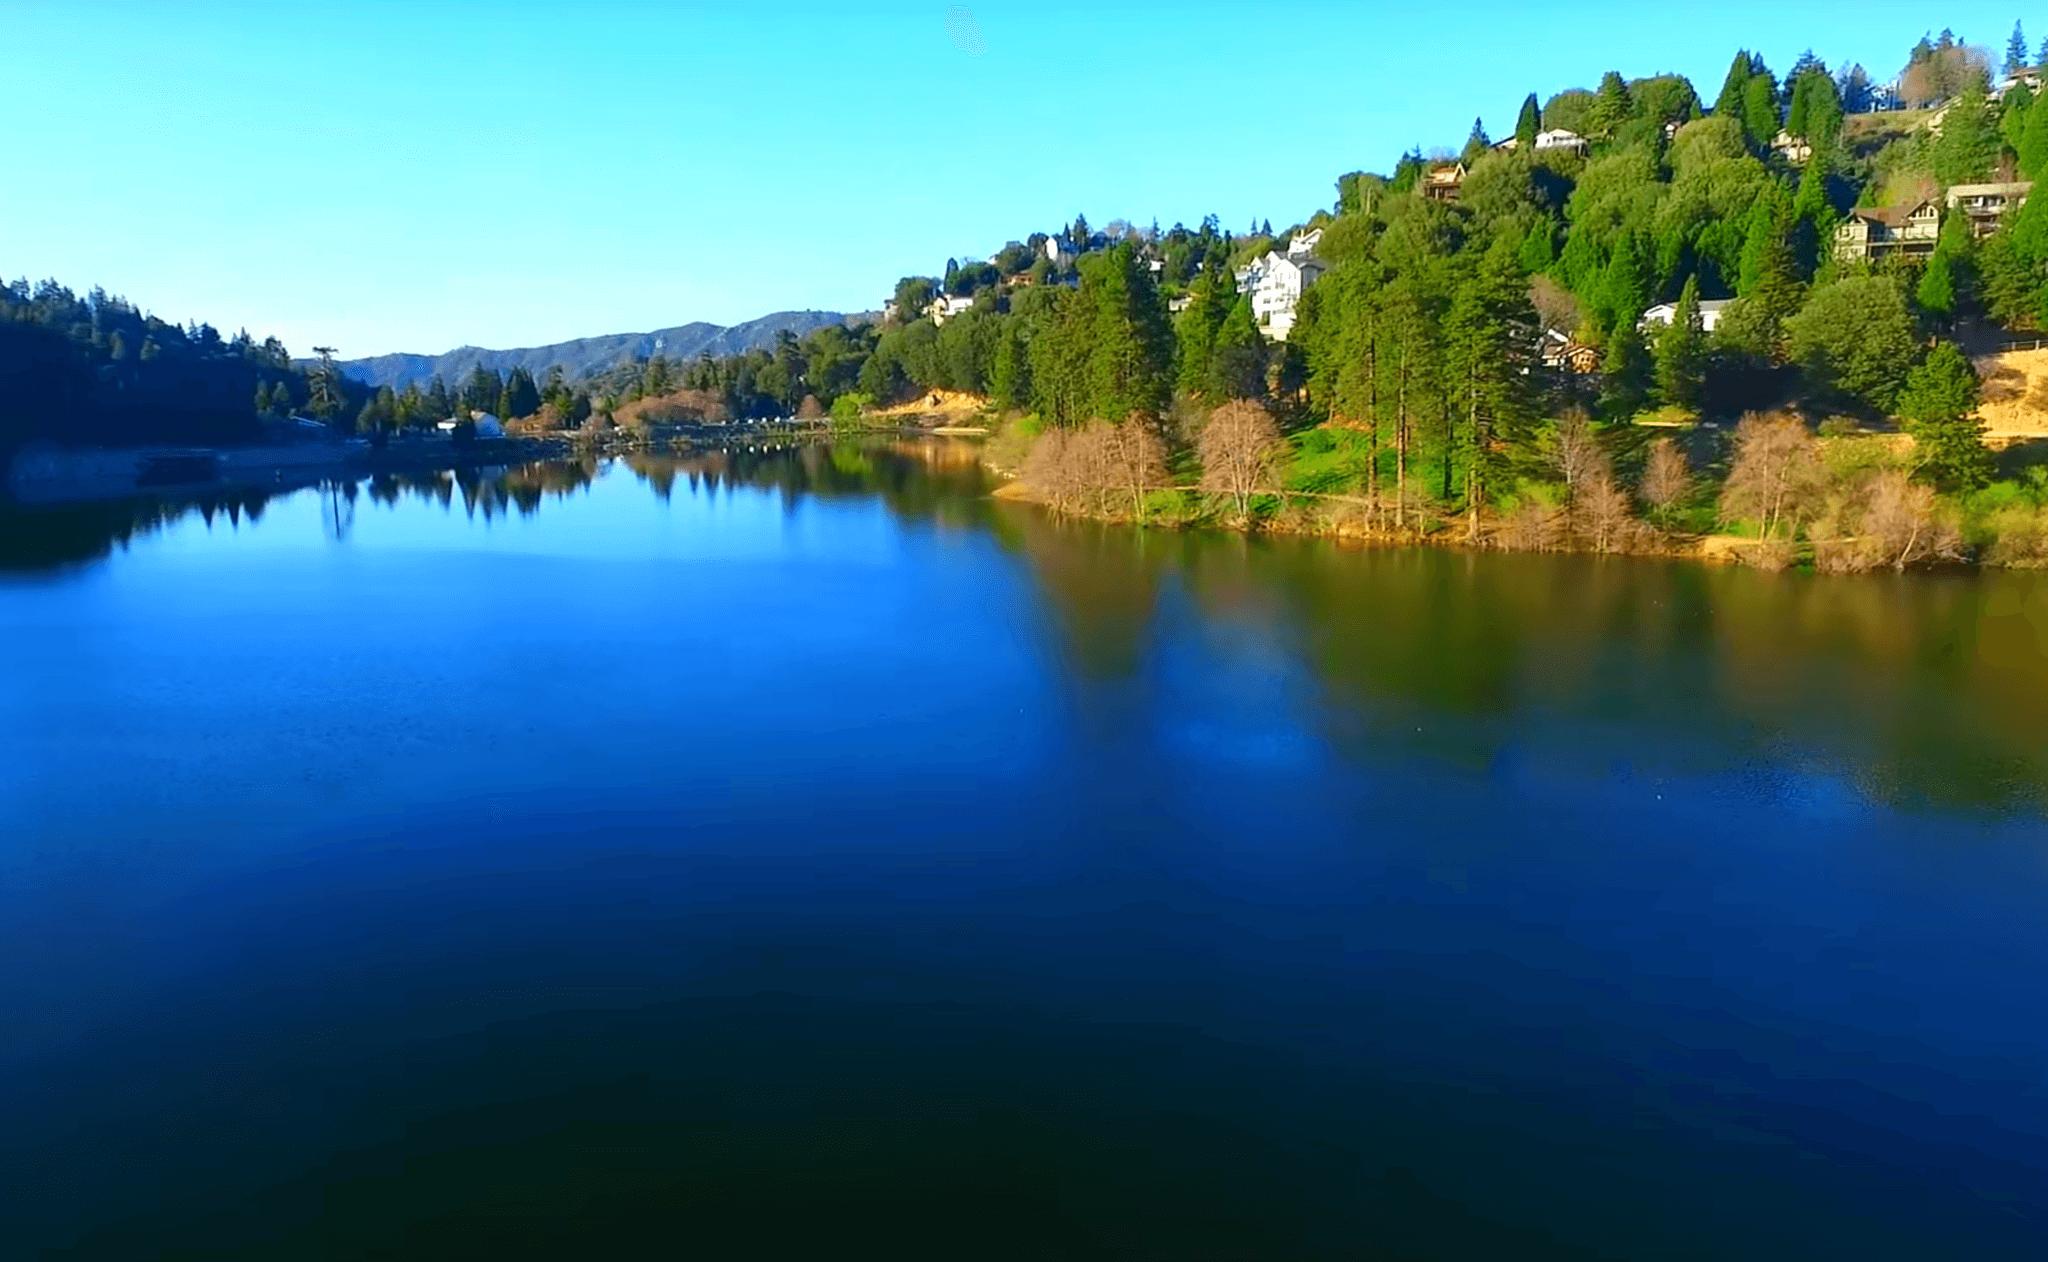 Lake-Gregory-Fishing-Guide-03